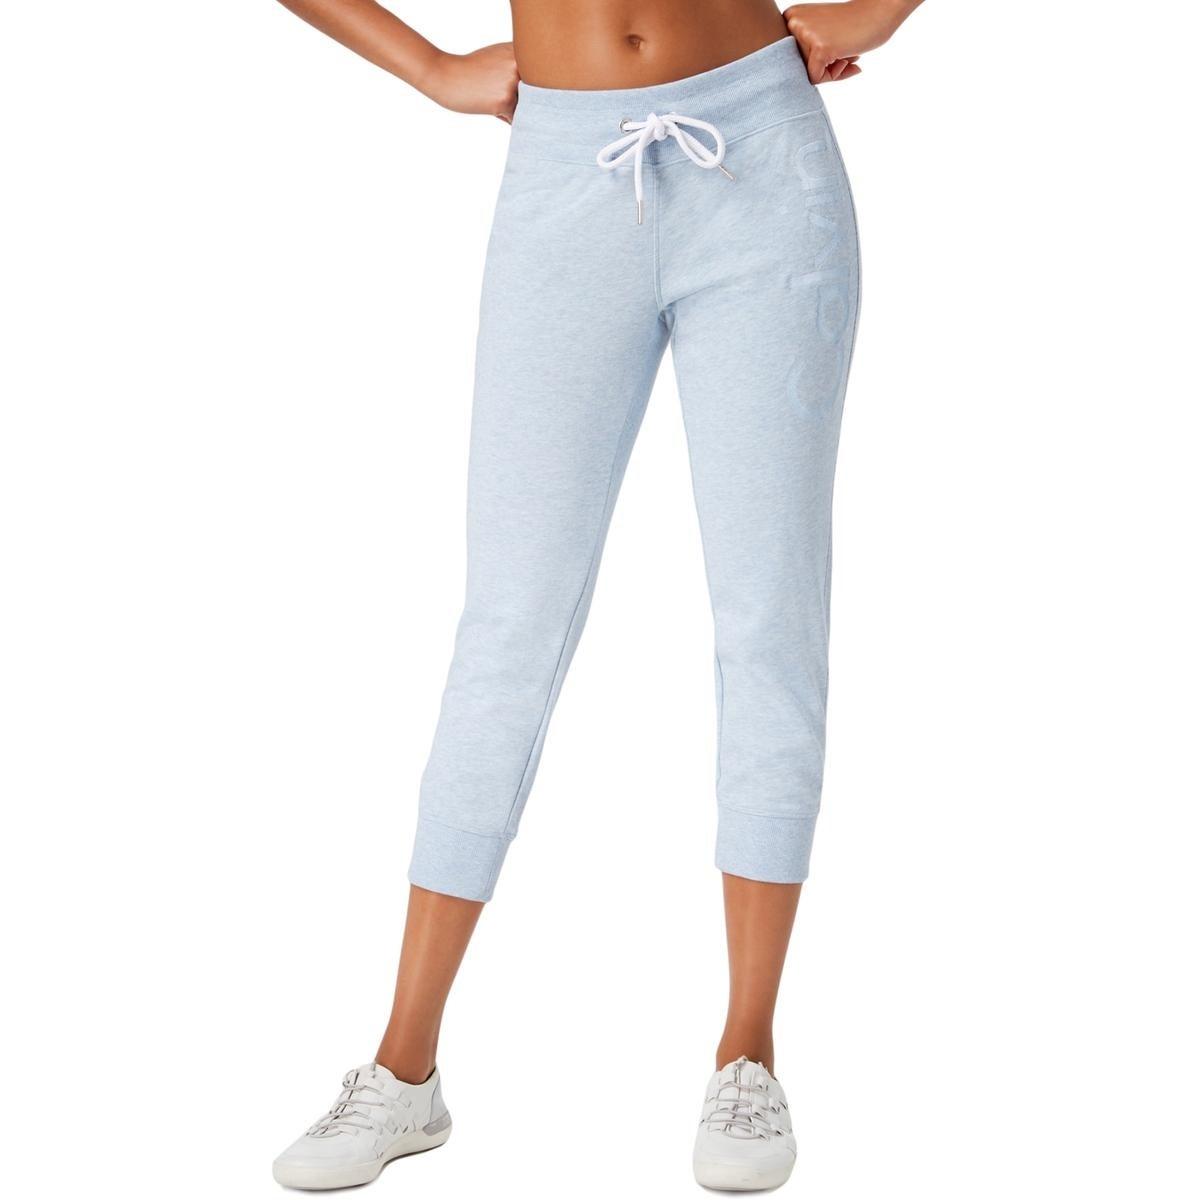 dc3eb022 Adidas Womens Daybreaker Slim Fit Track Pants Black